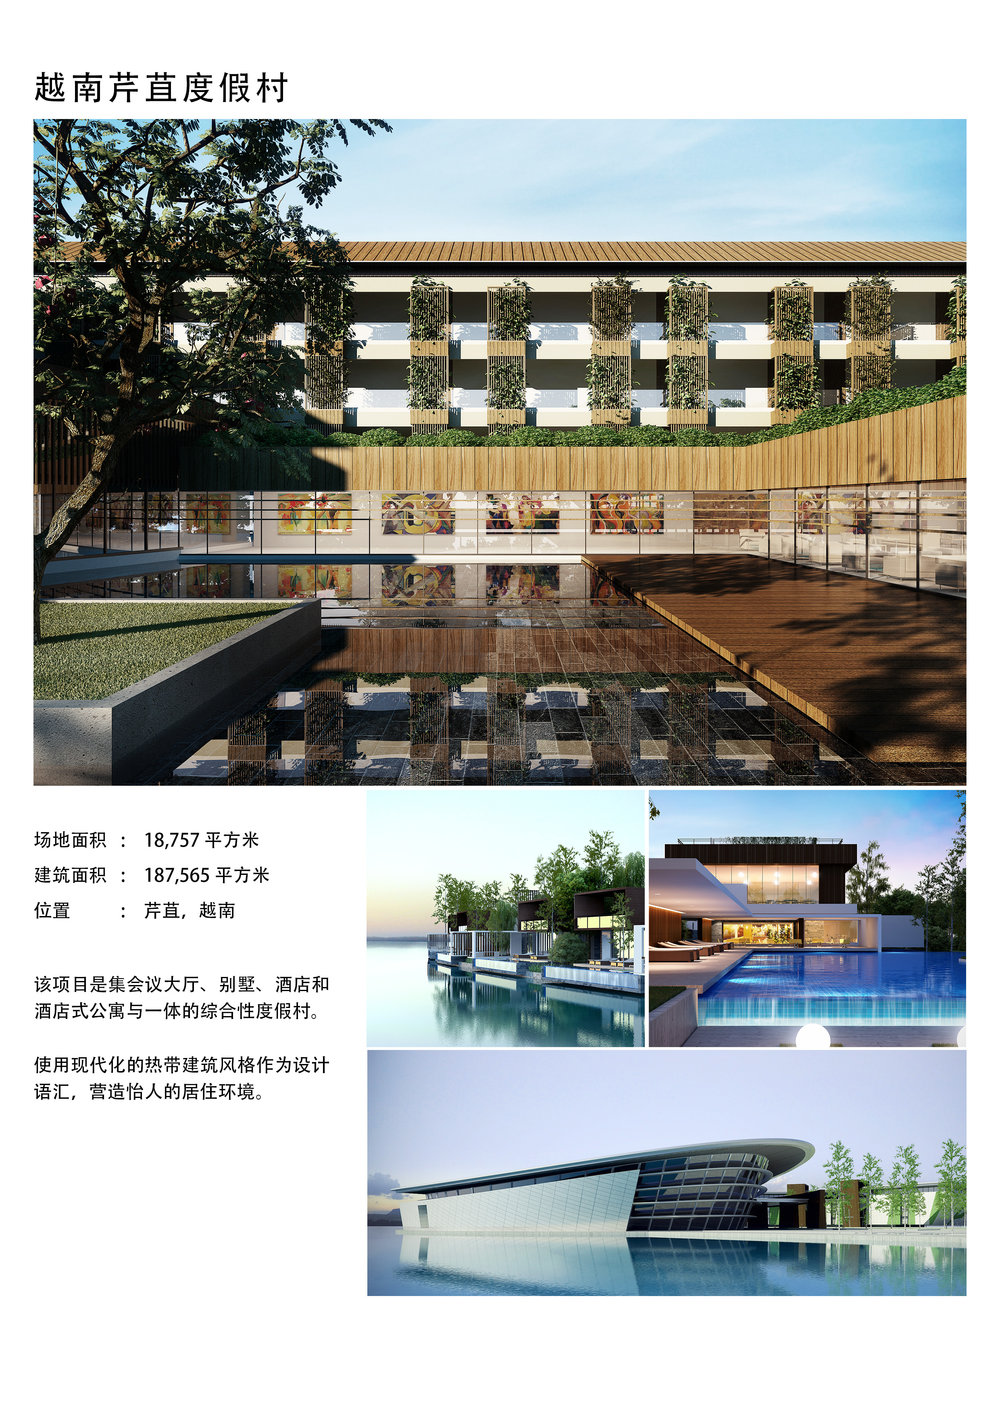 12_Vietnamcantho_cn.jpg